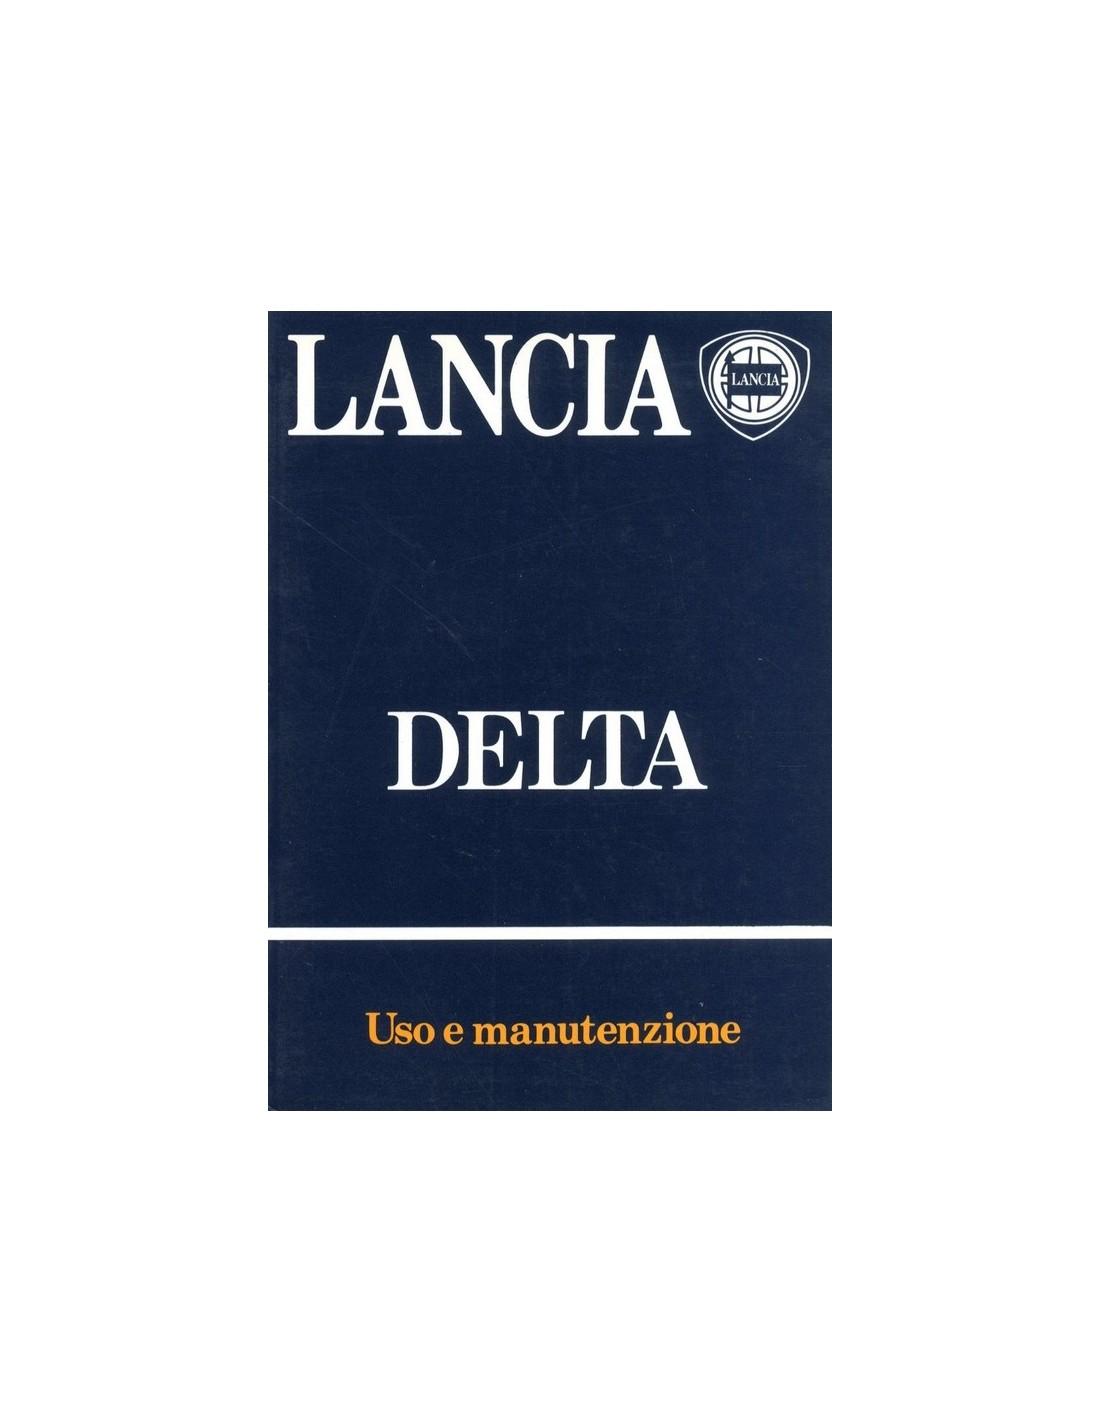 1983 lancia delta owners manual italian rh autolit eu delta owners manual/1345985 pdf delta 37-866x owner's manual